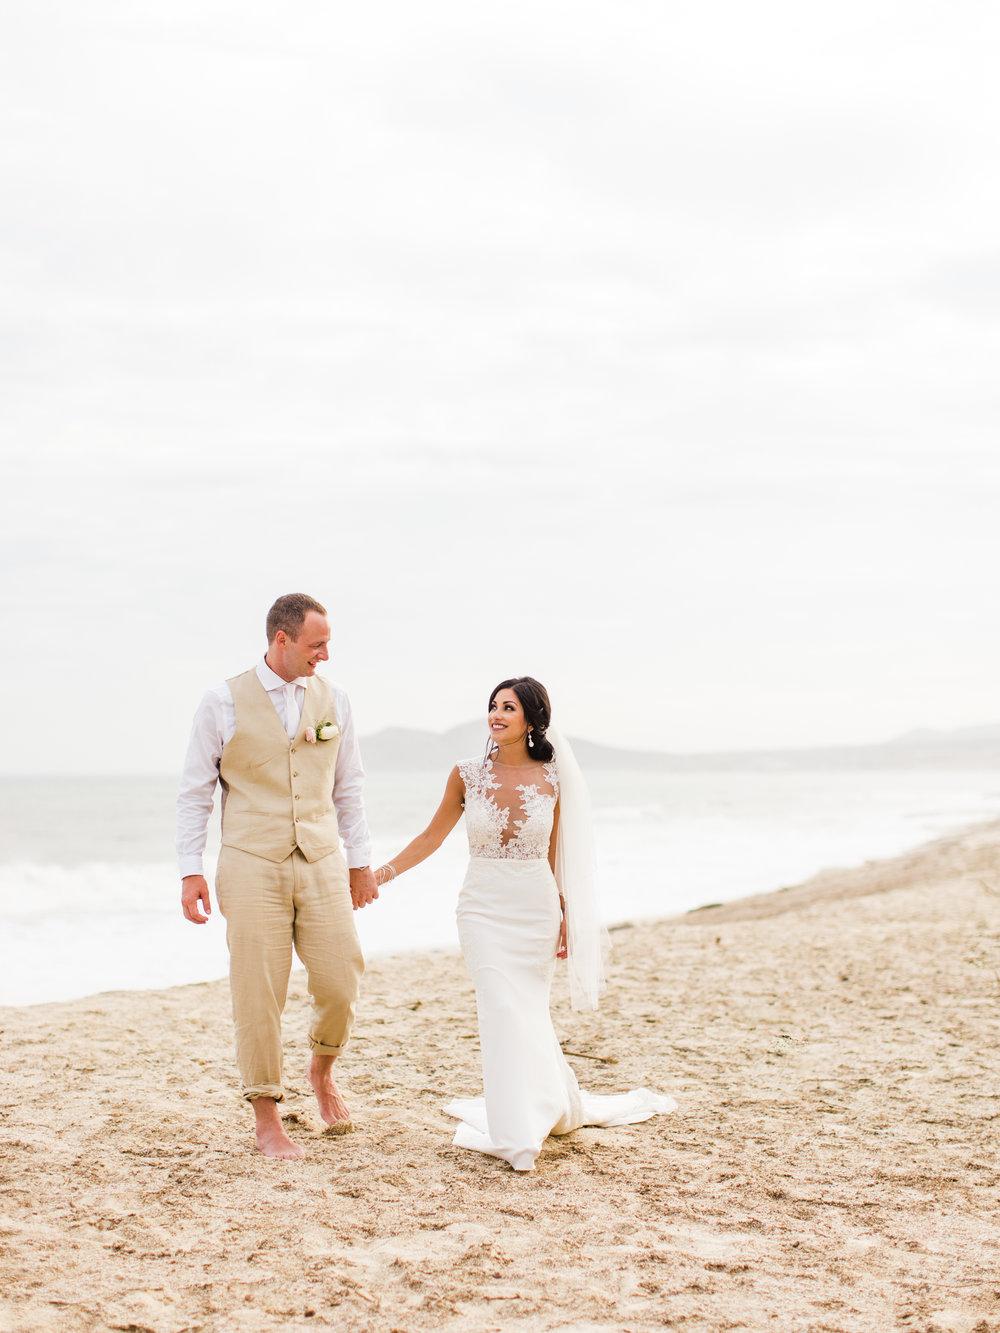 Deanna-and-John-Fahey-Wedding-Los-Cabos-Mexico-Brandon-J-Ferlin-Photography-312.jpg